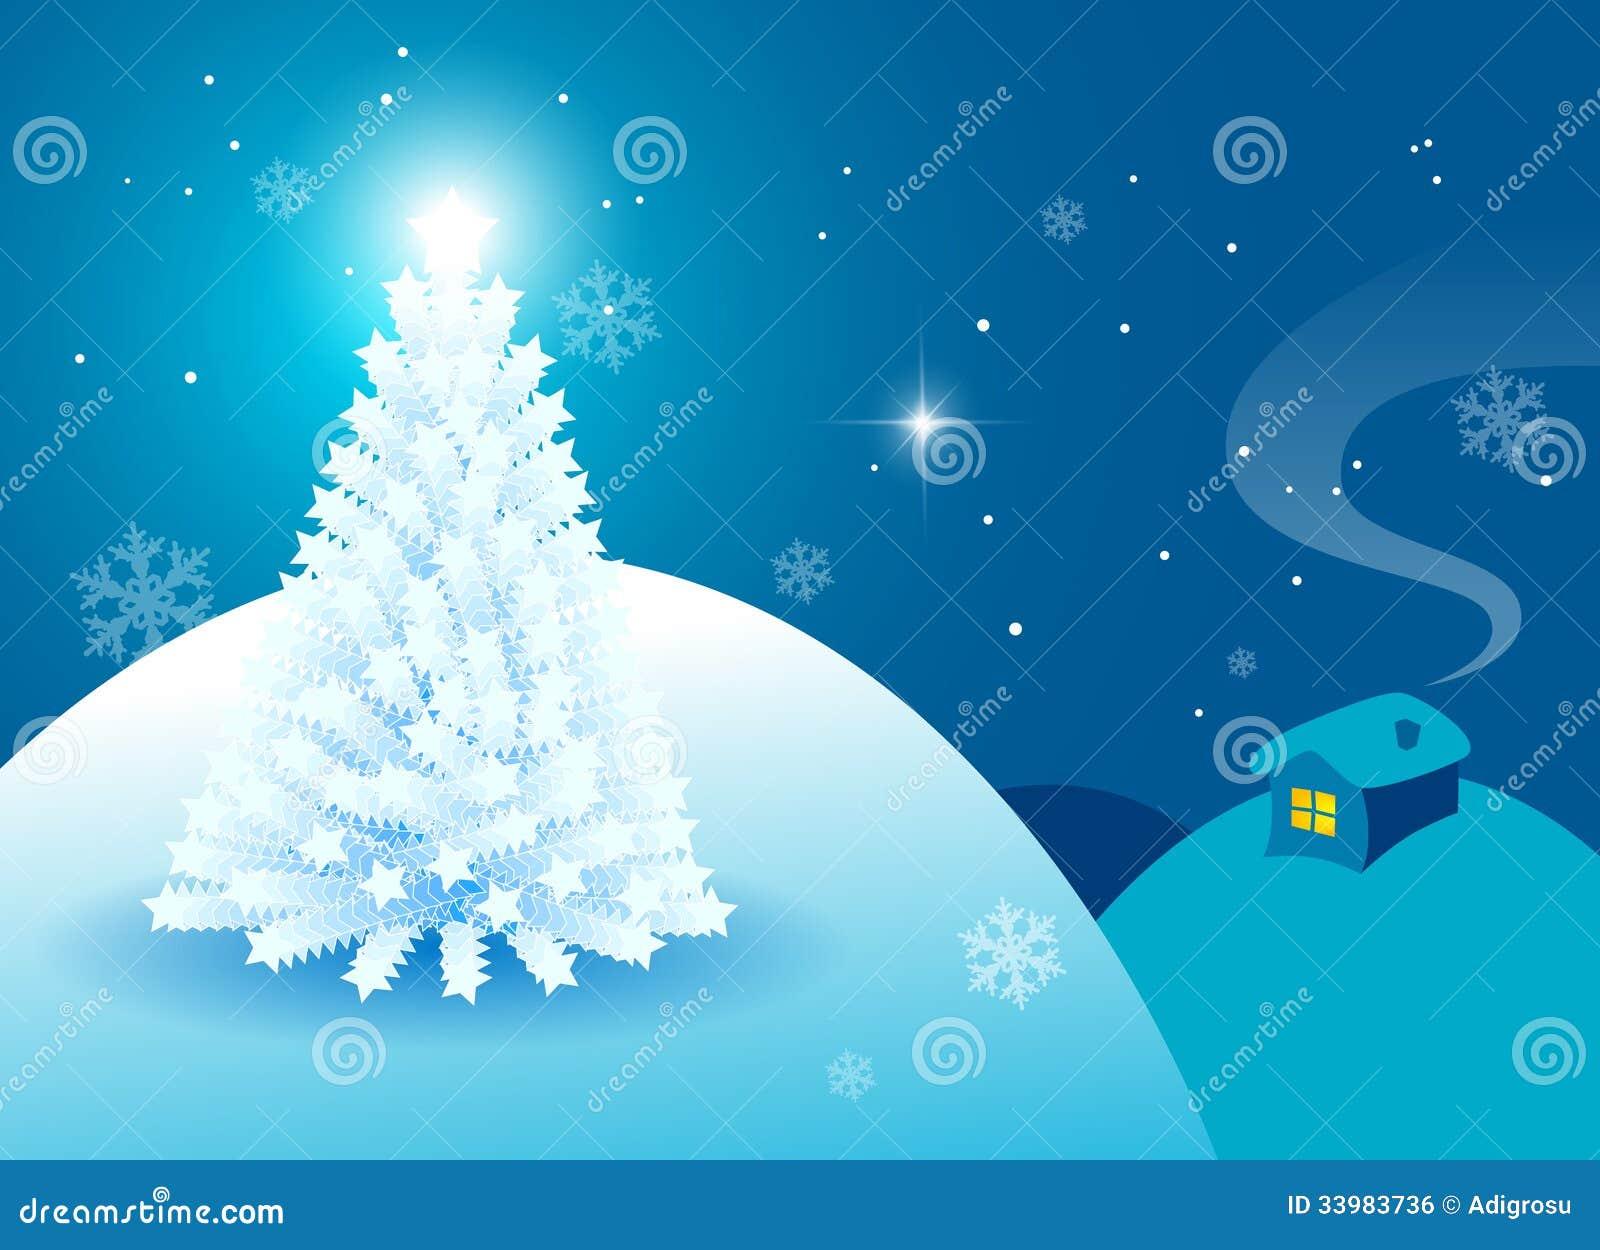 1300 x 1033 jpeg 128kB, White Christmas Card Royalty Free Stock Image ...